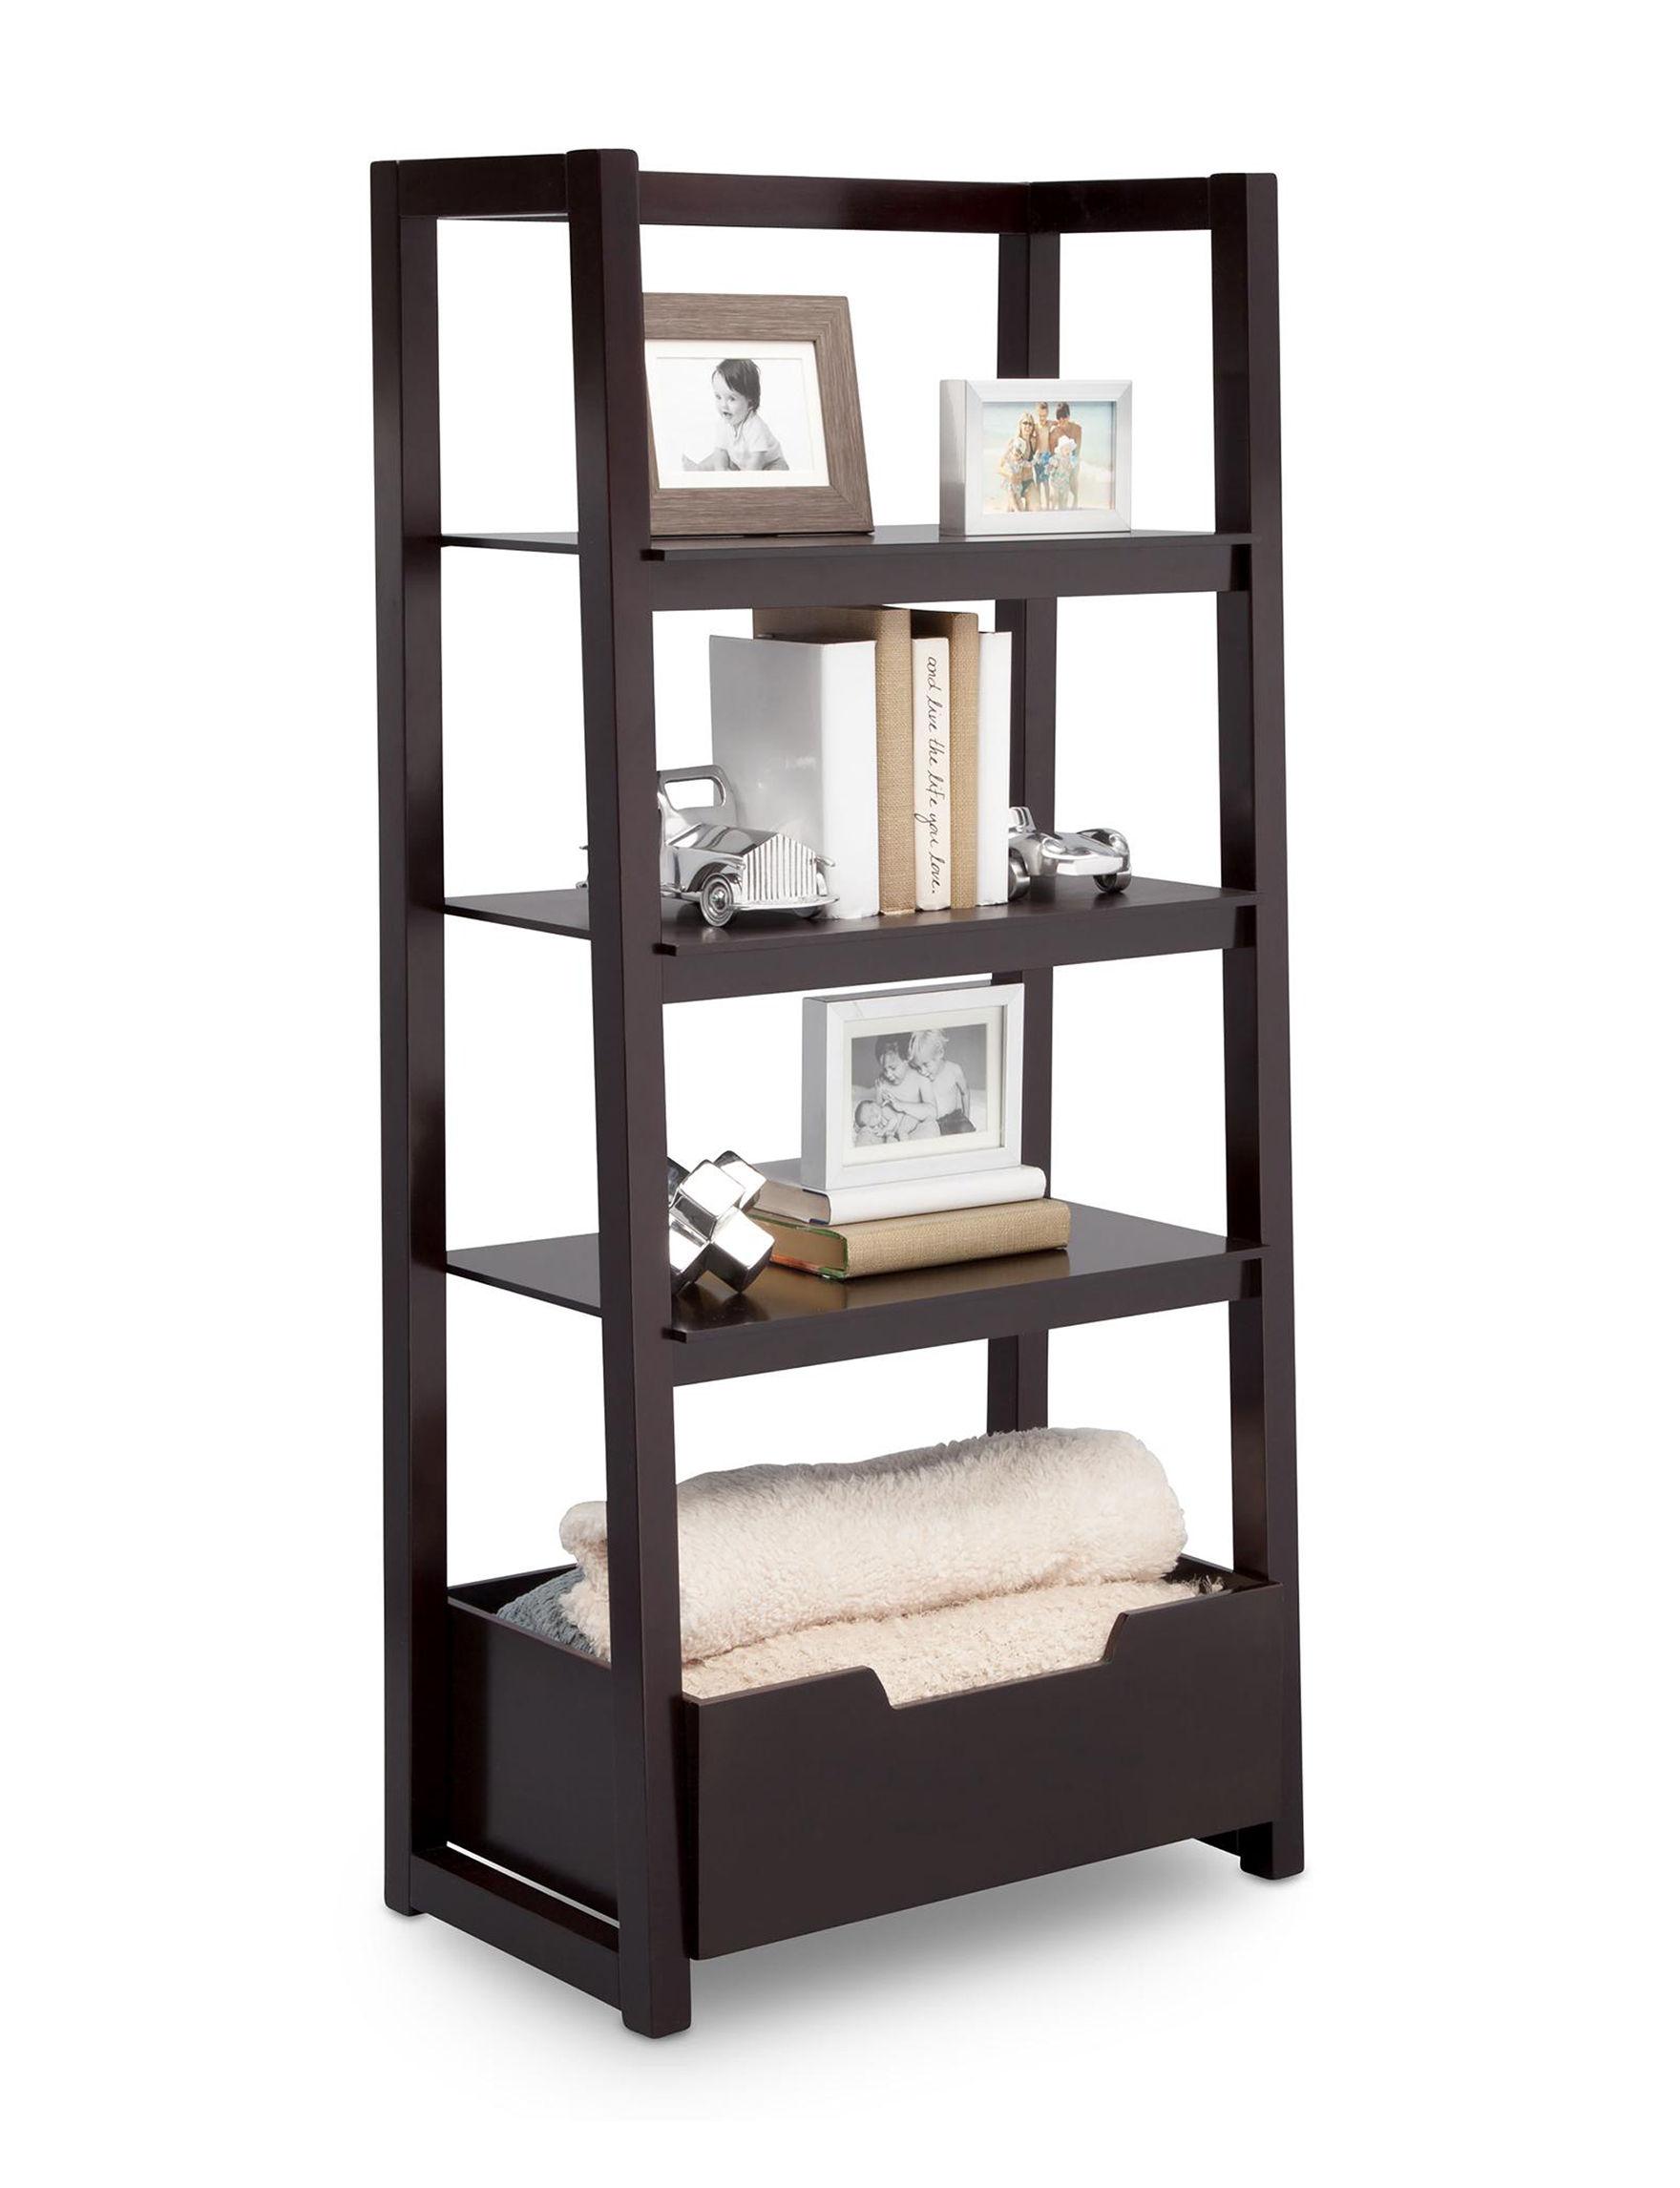 Delta Dark Chocolate Bookcases & Shelves Bedroom Furniture